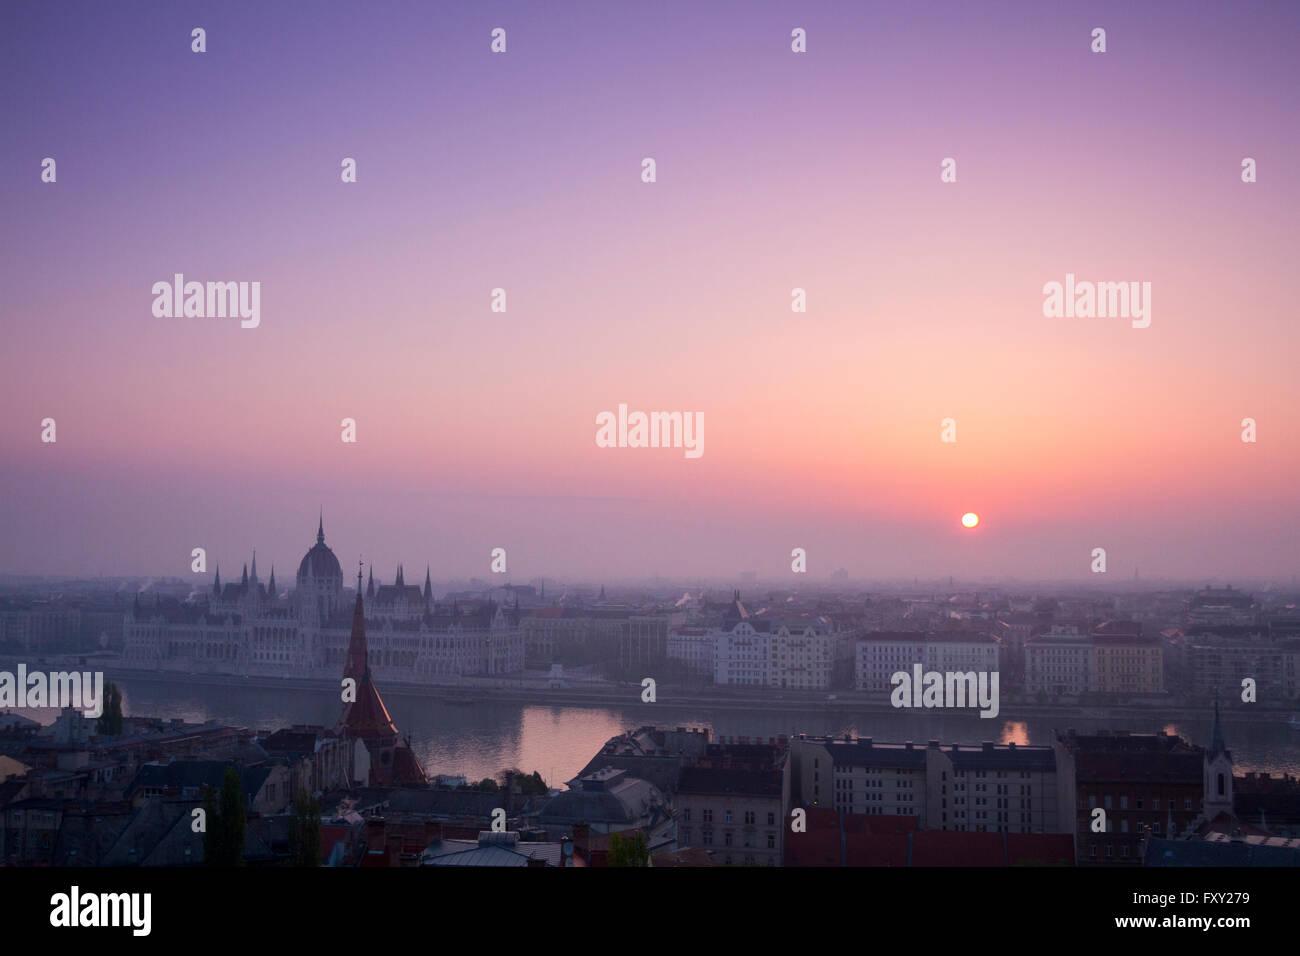 Sunrise and panoramic views from Fisherman's Bastion, Budapest, Hungary. - Stock Image